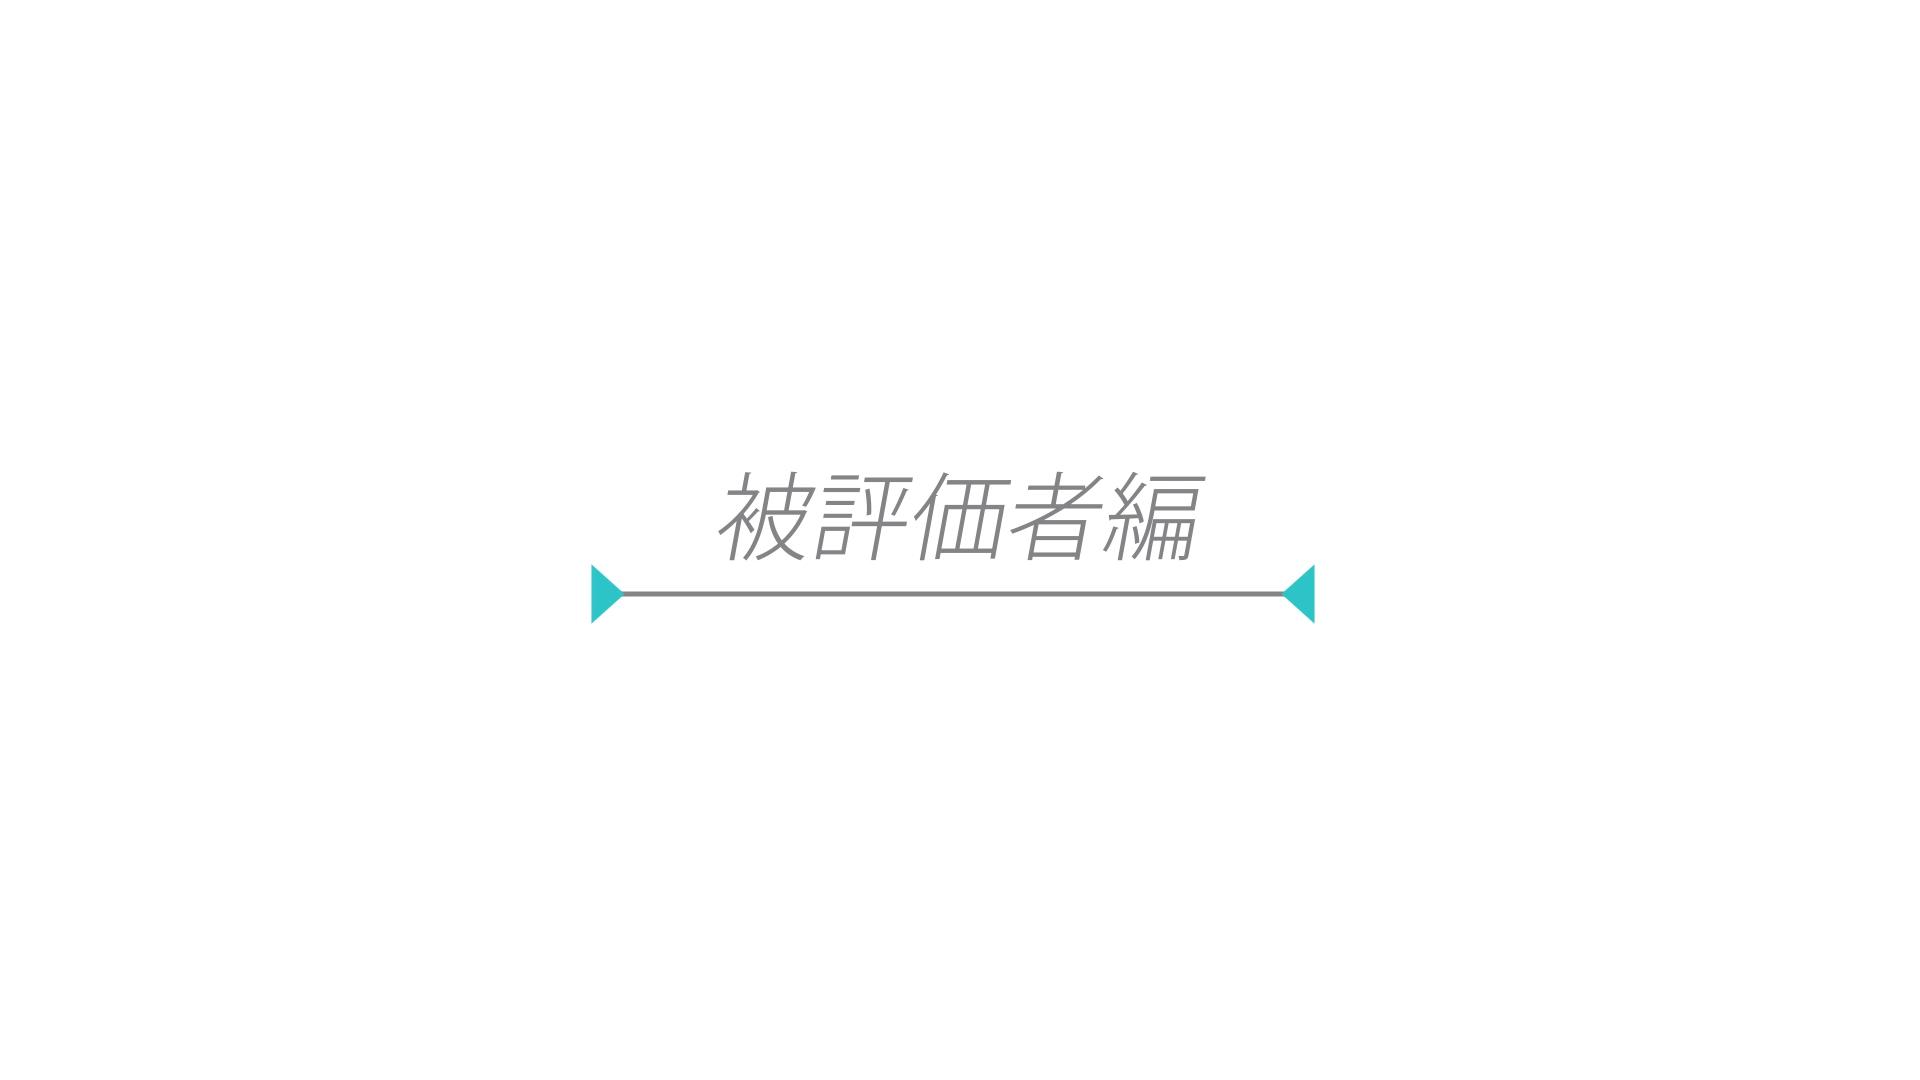 pth-evaluated-user-sub